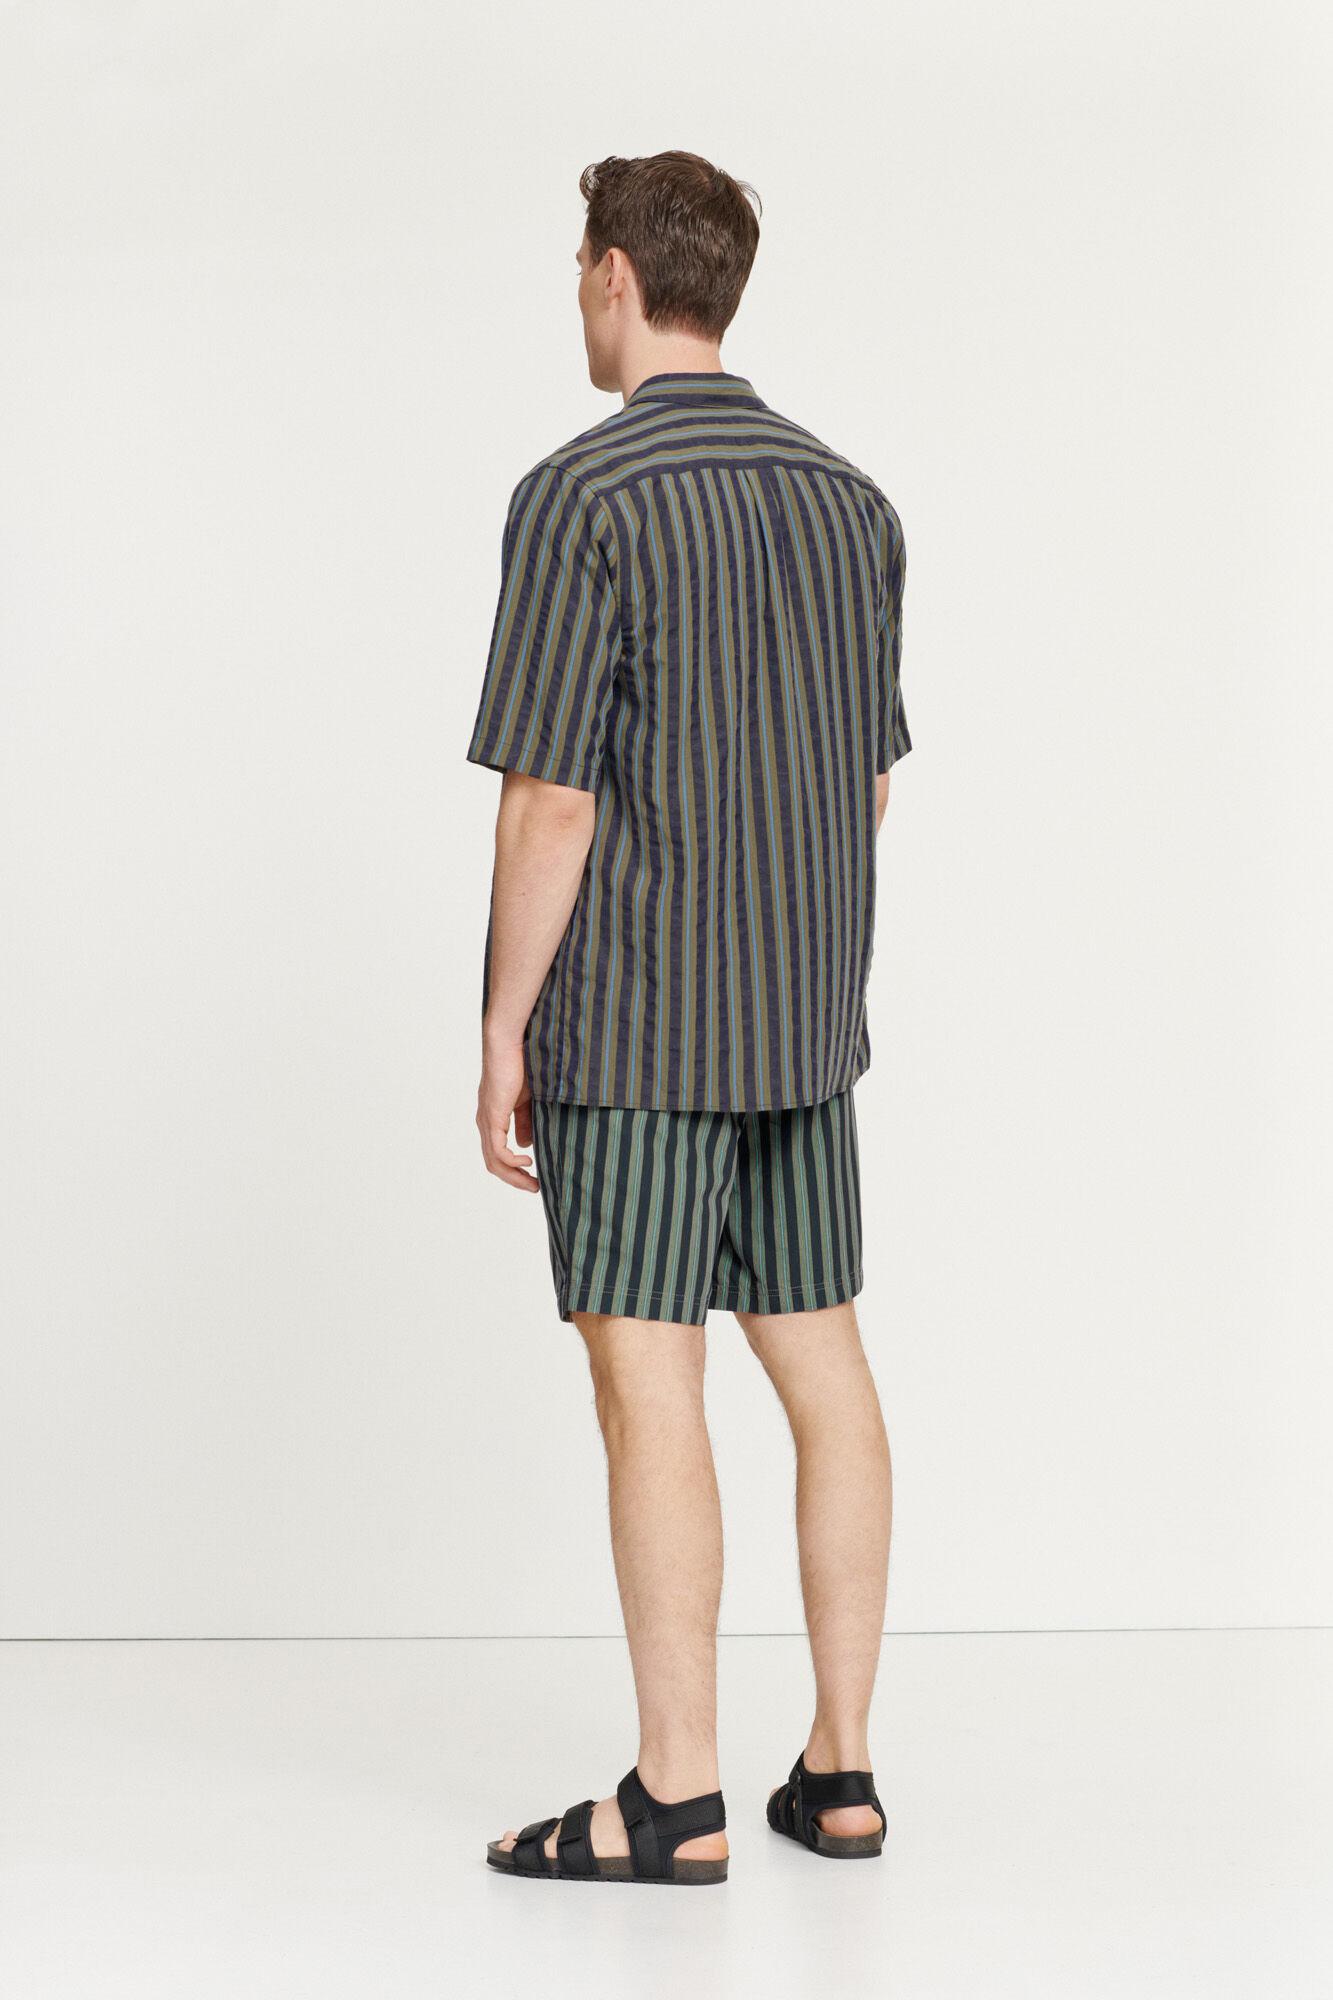 Taro NX shirt 11530, THYME ST.